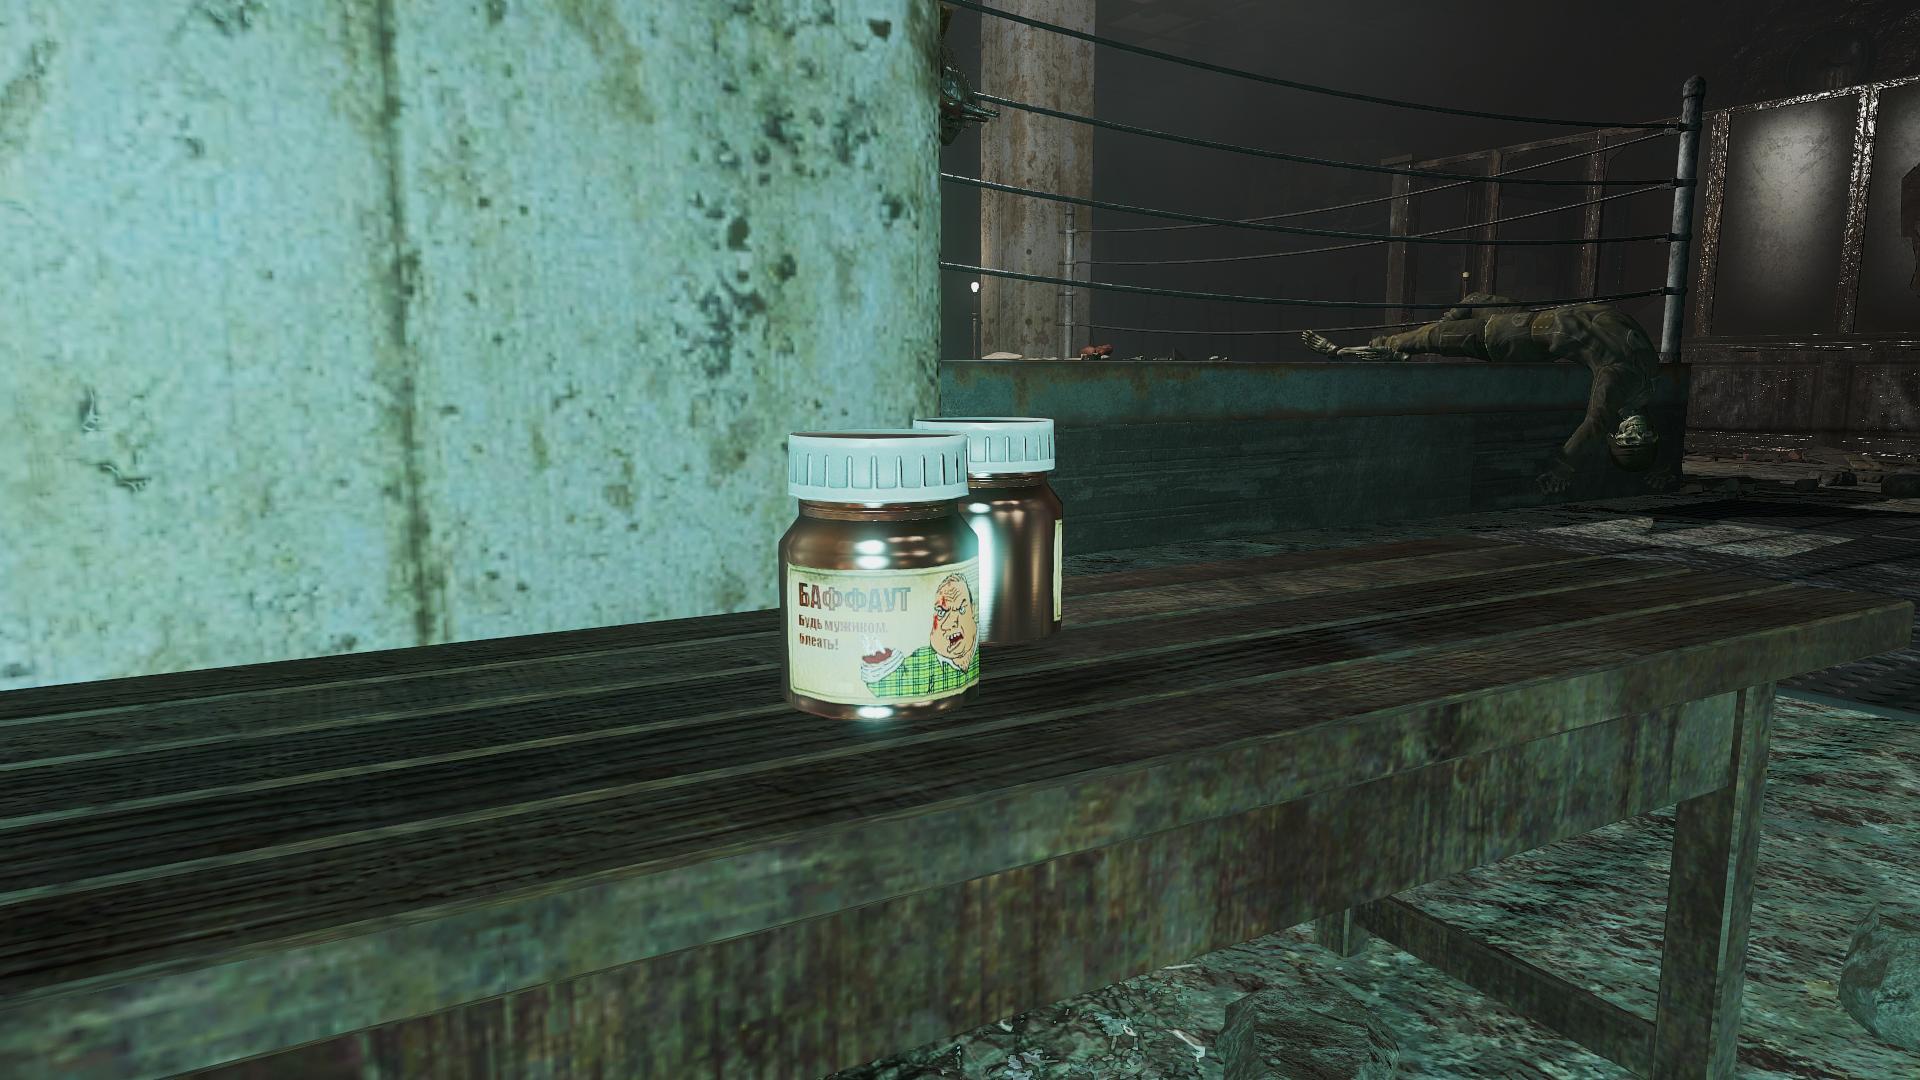 00043.jpg - Fallout 4